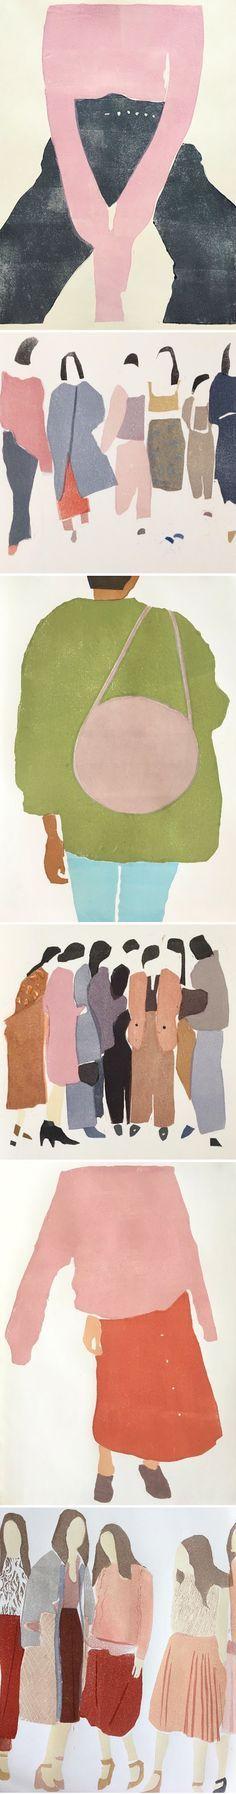 monotypes by renée gouin